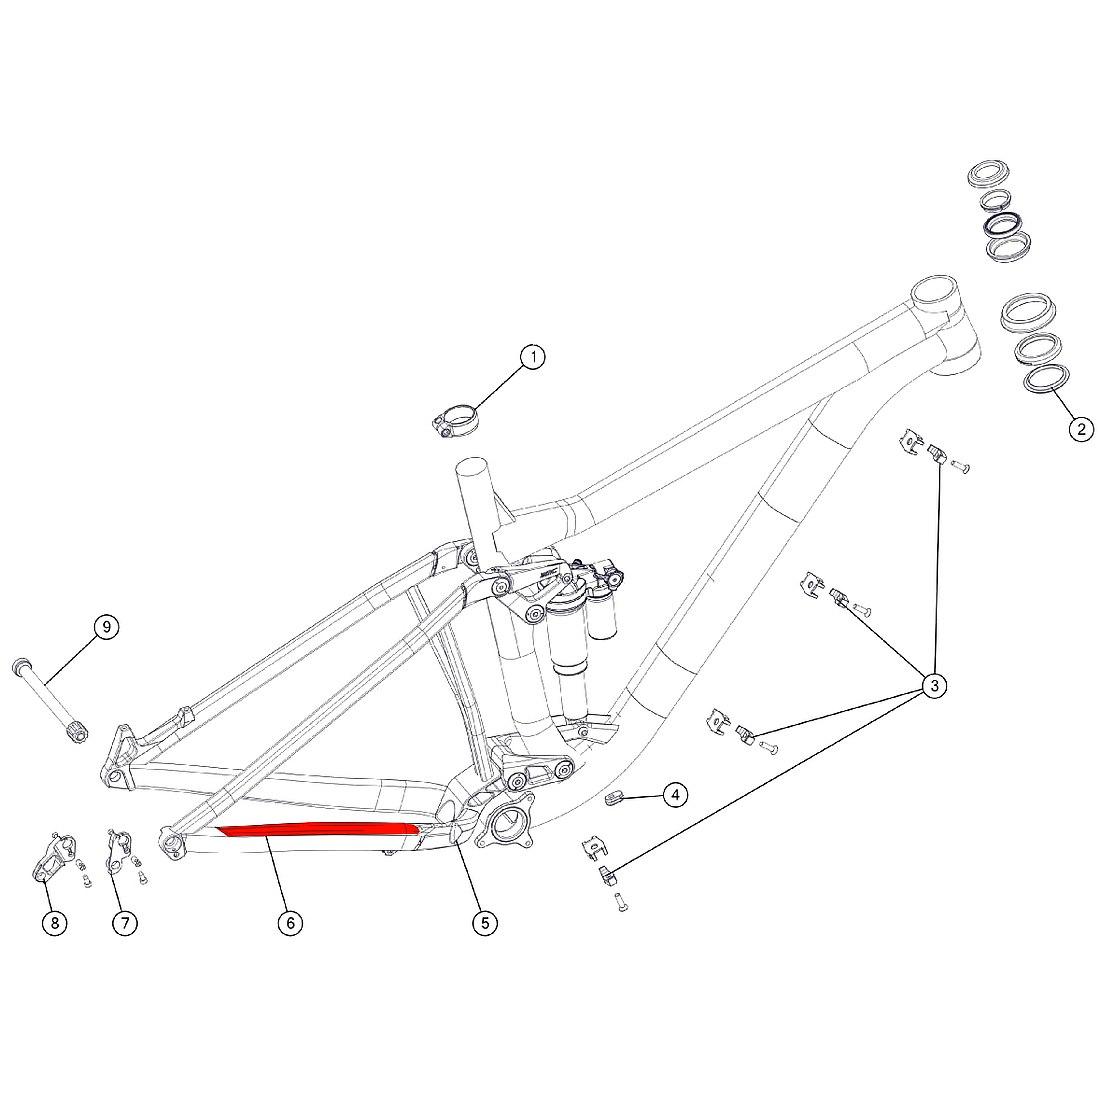 BMC Chainstay Protector for Trailfox 02 / 03 (MY 2018) - 301186 - black